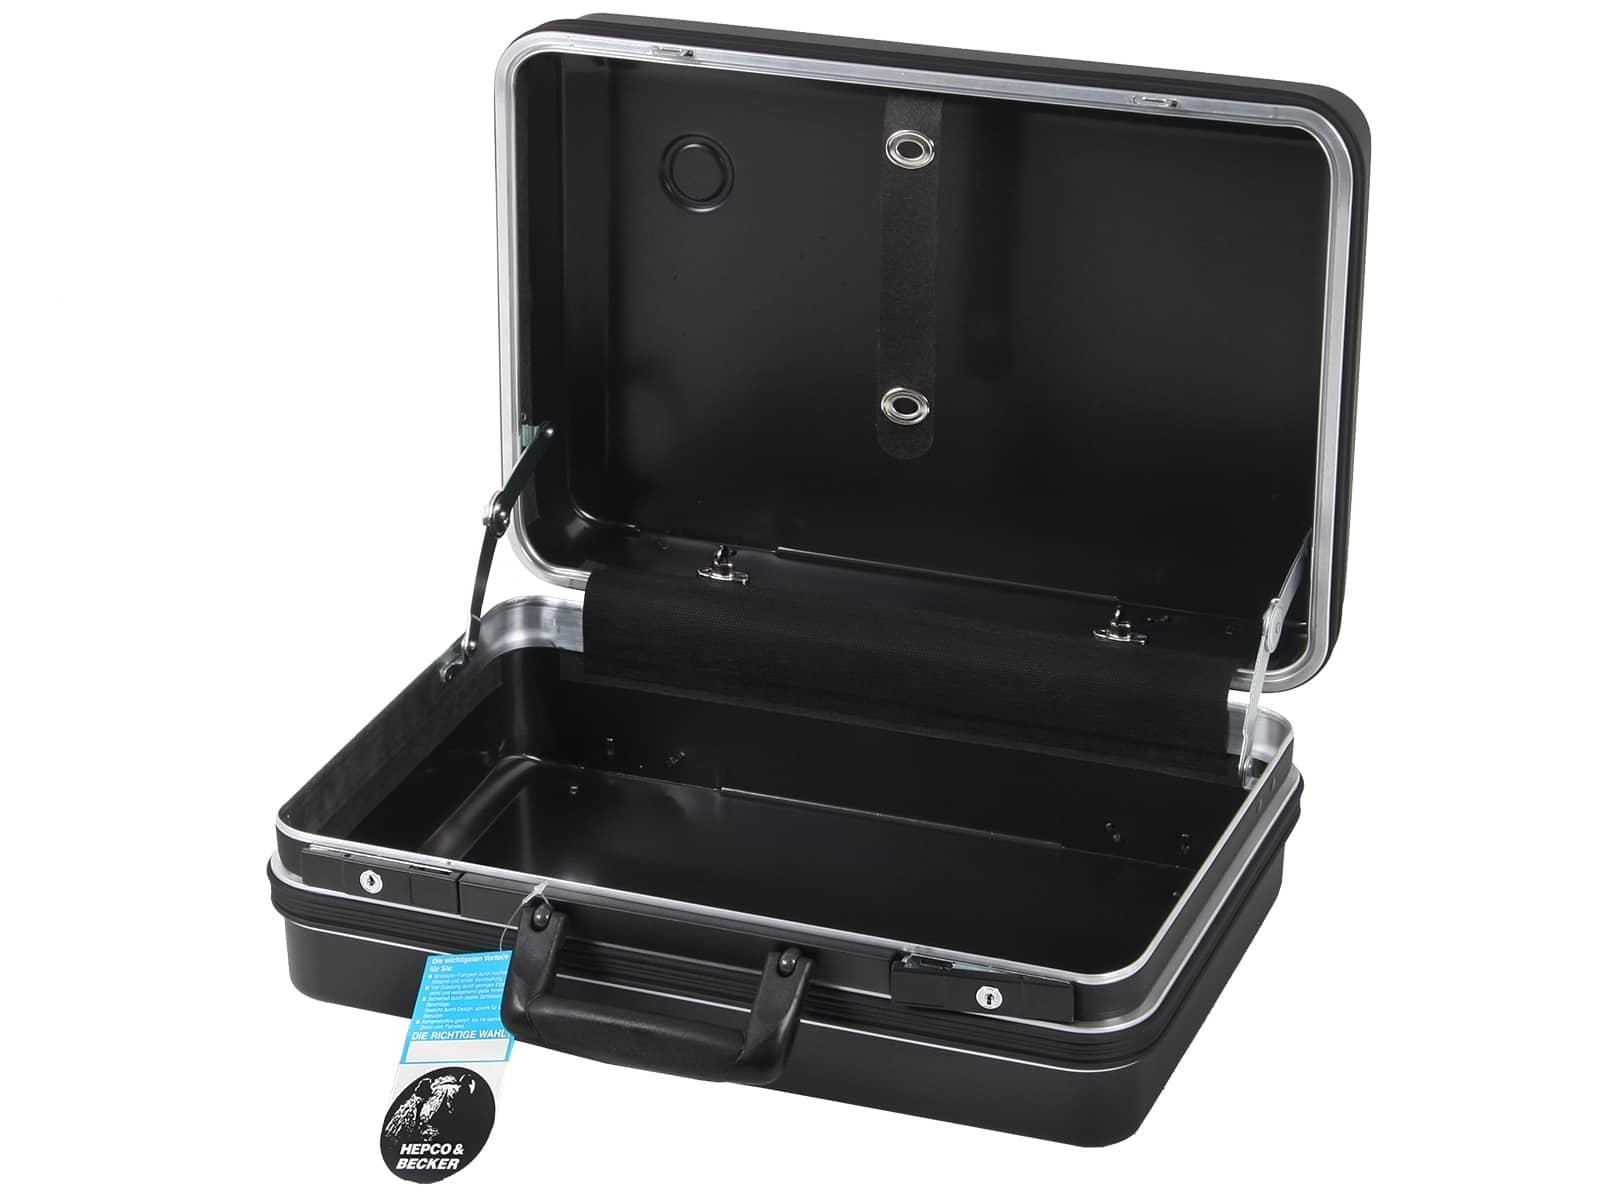 Werkzeugkoffer Classic 5112 ABS Pro 25 ltr. L2 Leerkoffer